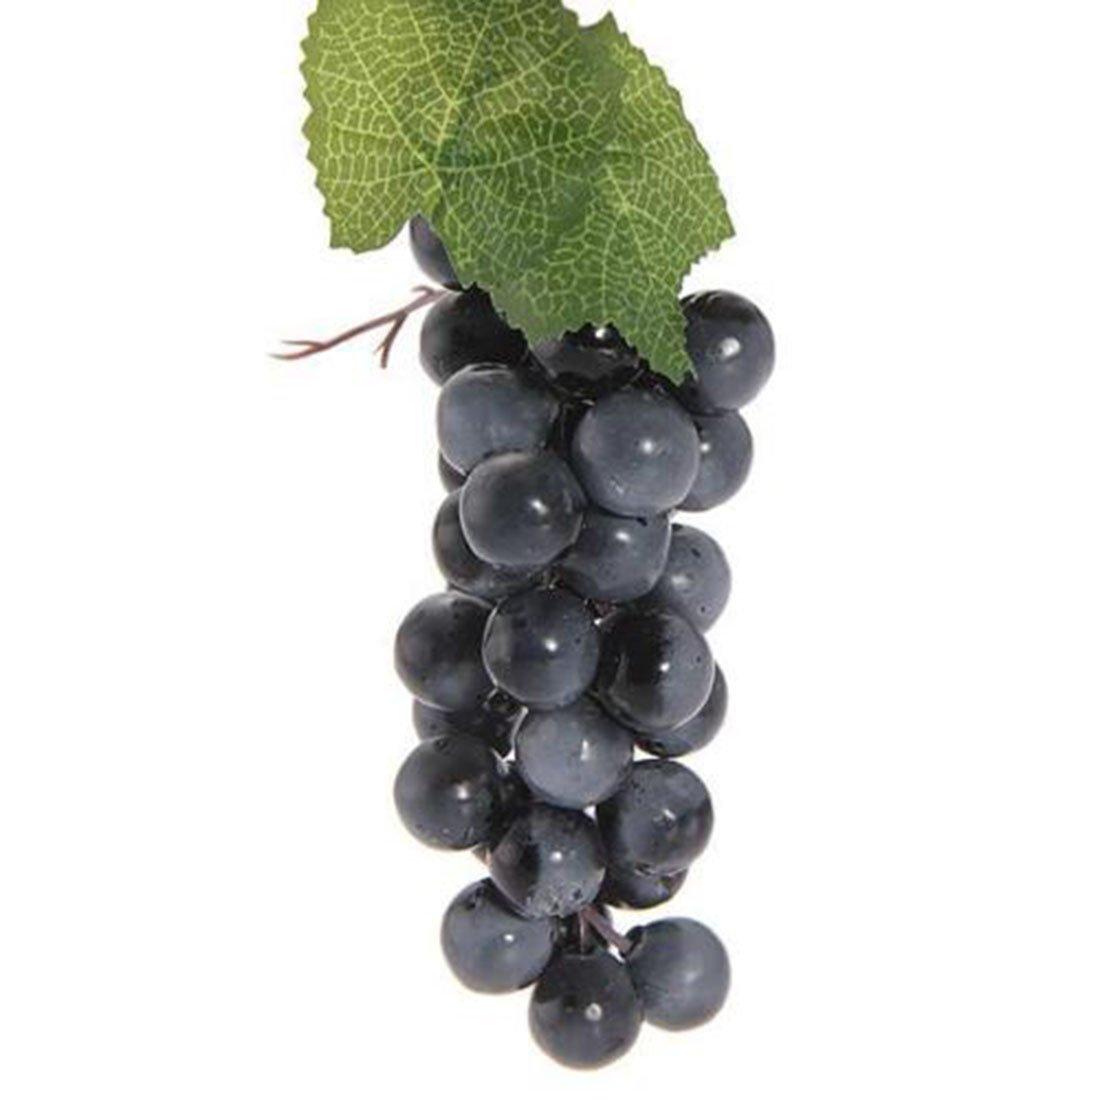 black Simulation Fruit Artificial 22-85 grain Fruit Grapes Plastic Fake Decorative Fruit Lifelike Wedding Party Garden Decor